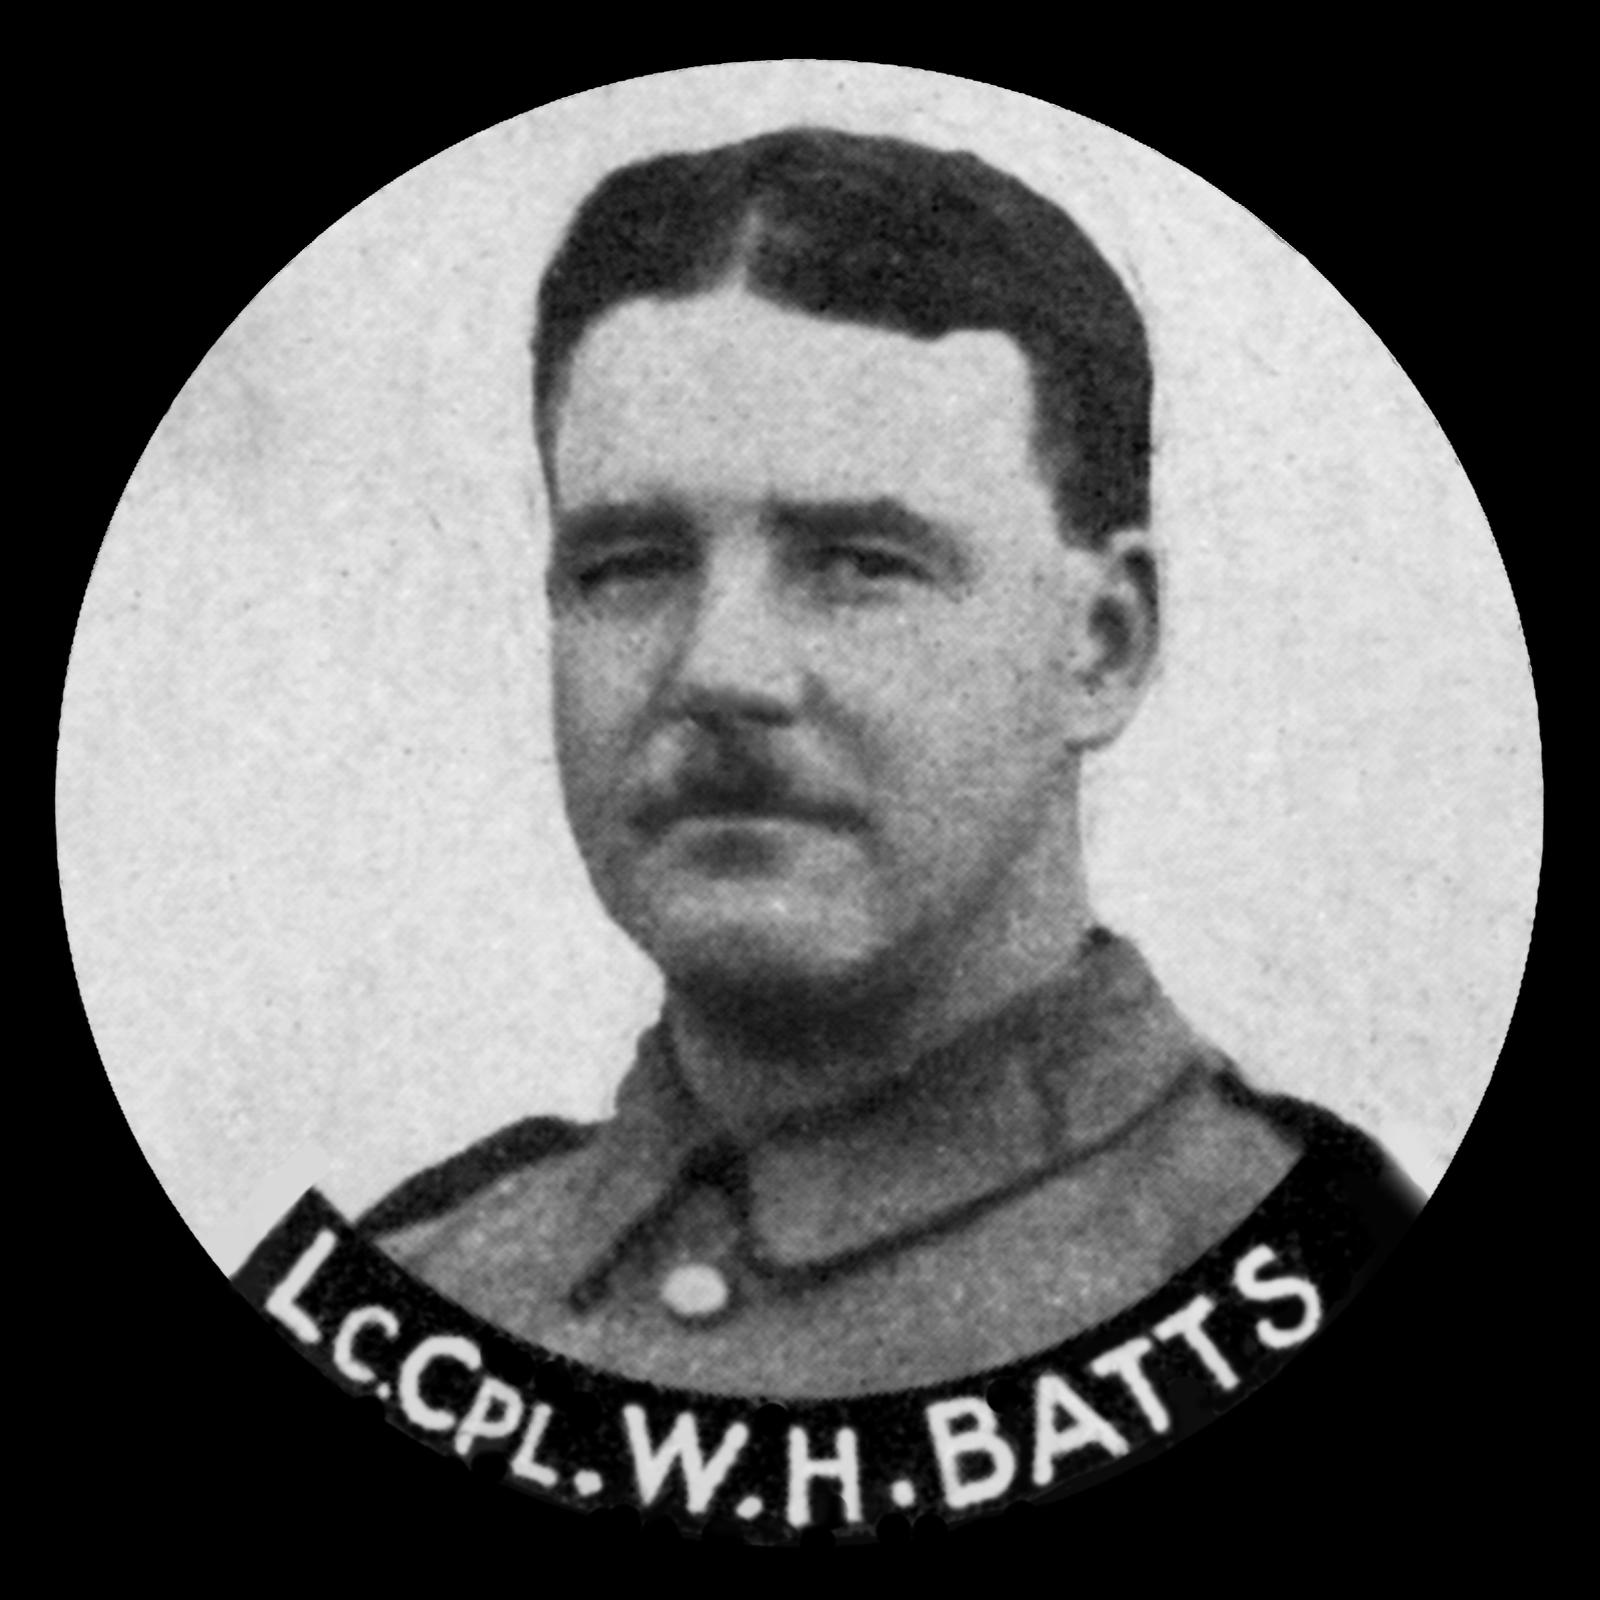 BATTS William Henry